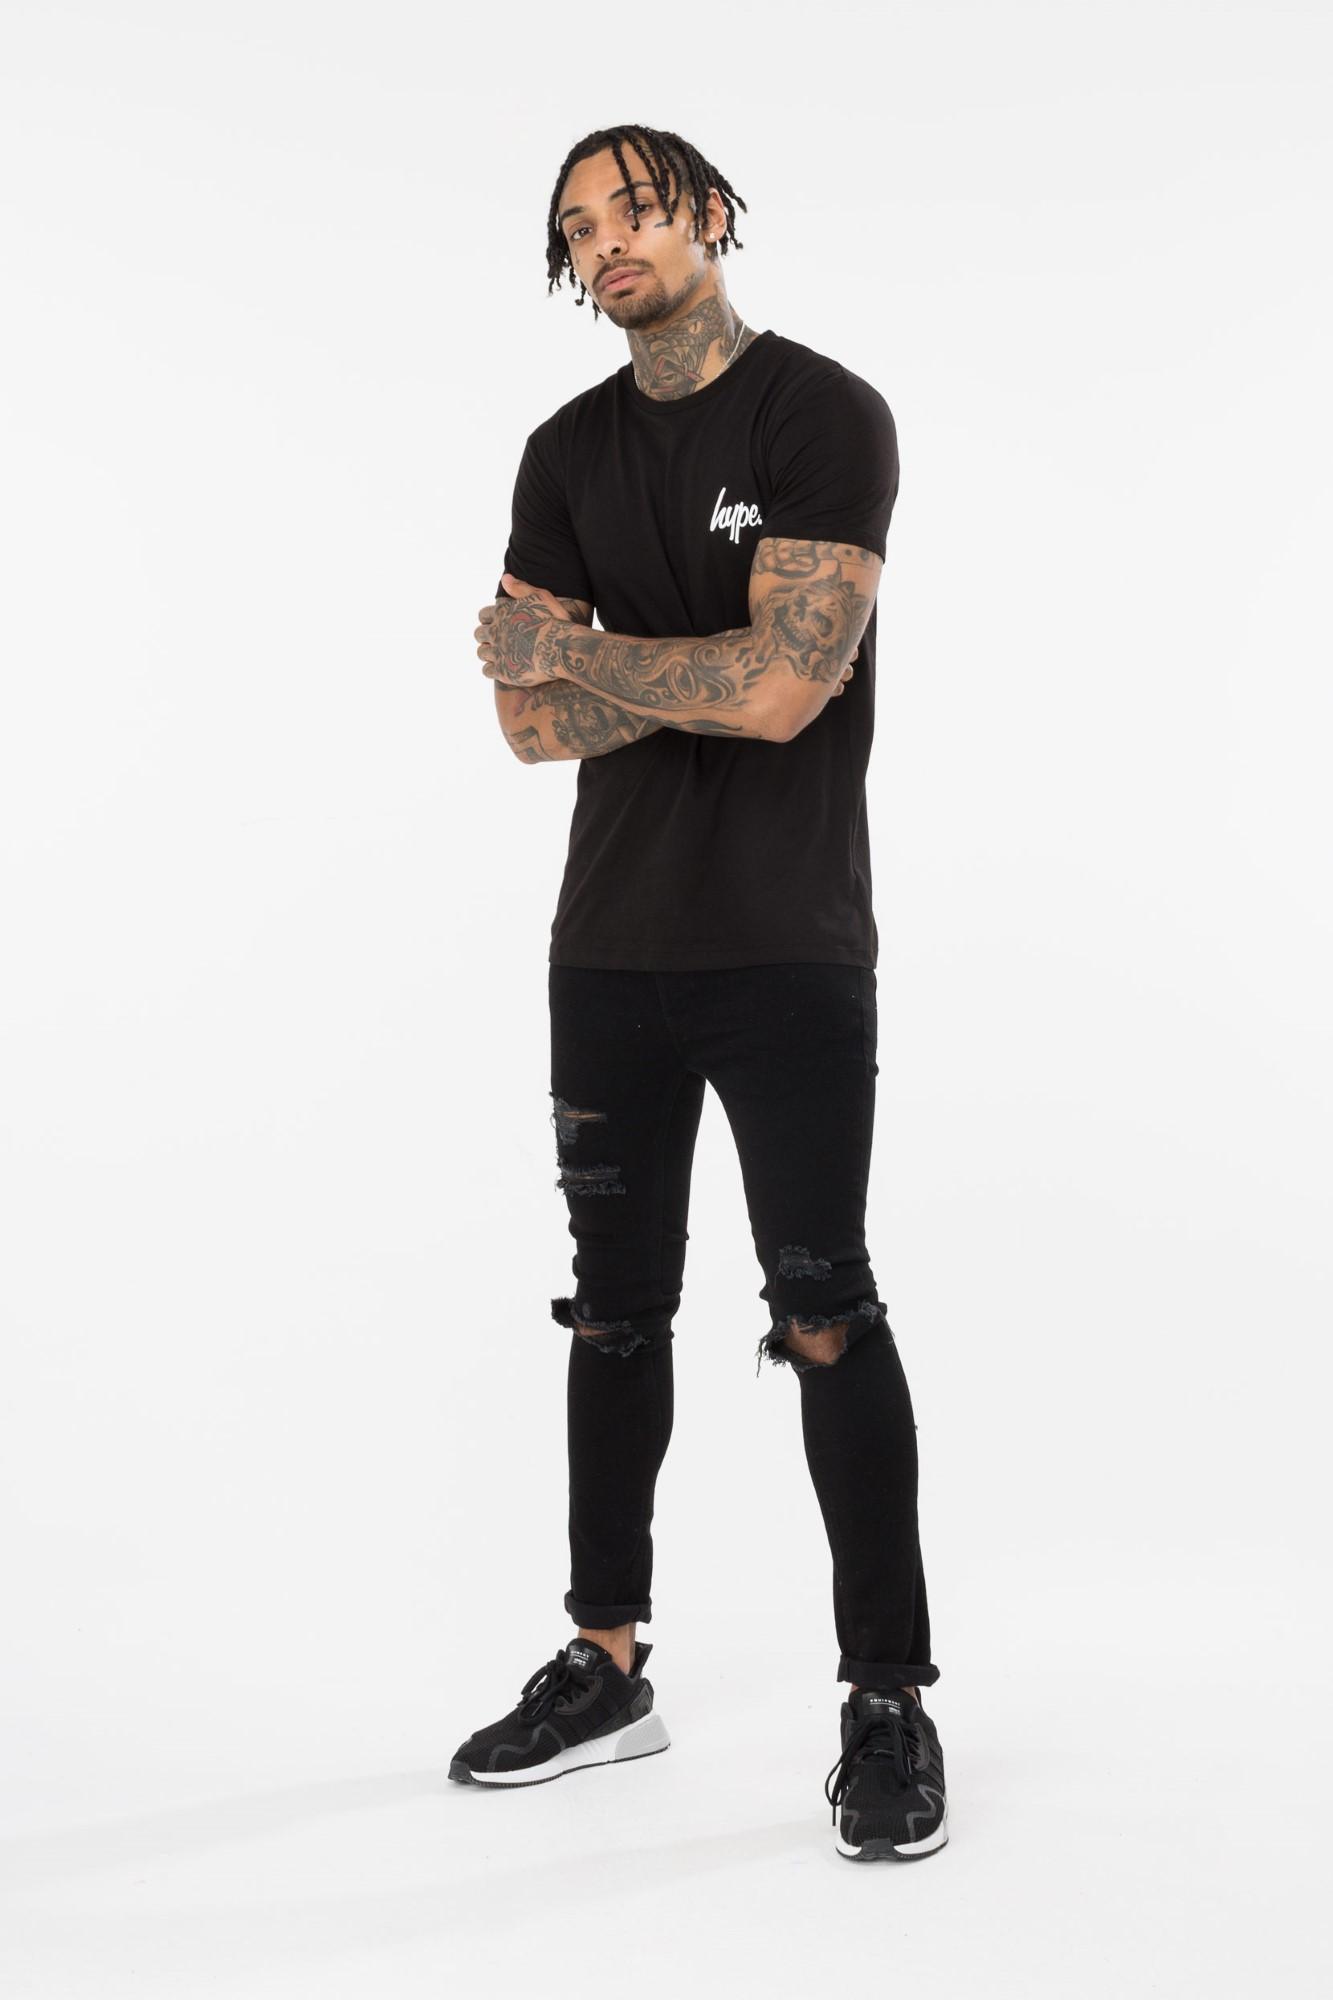 Hype Back Crest Men'S T-Shirt Black M